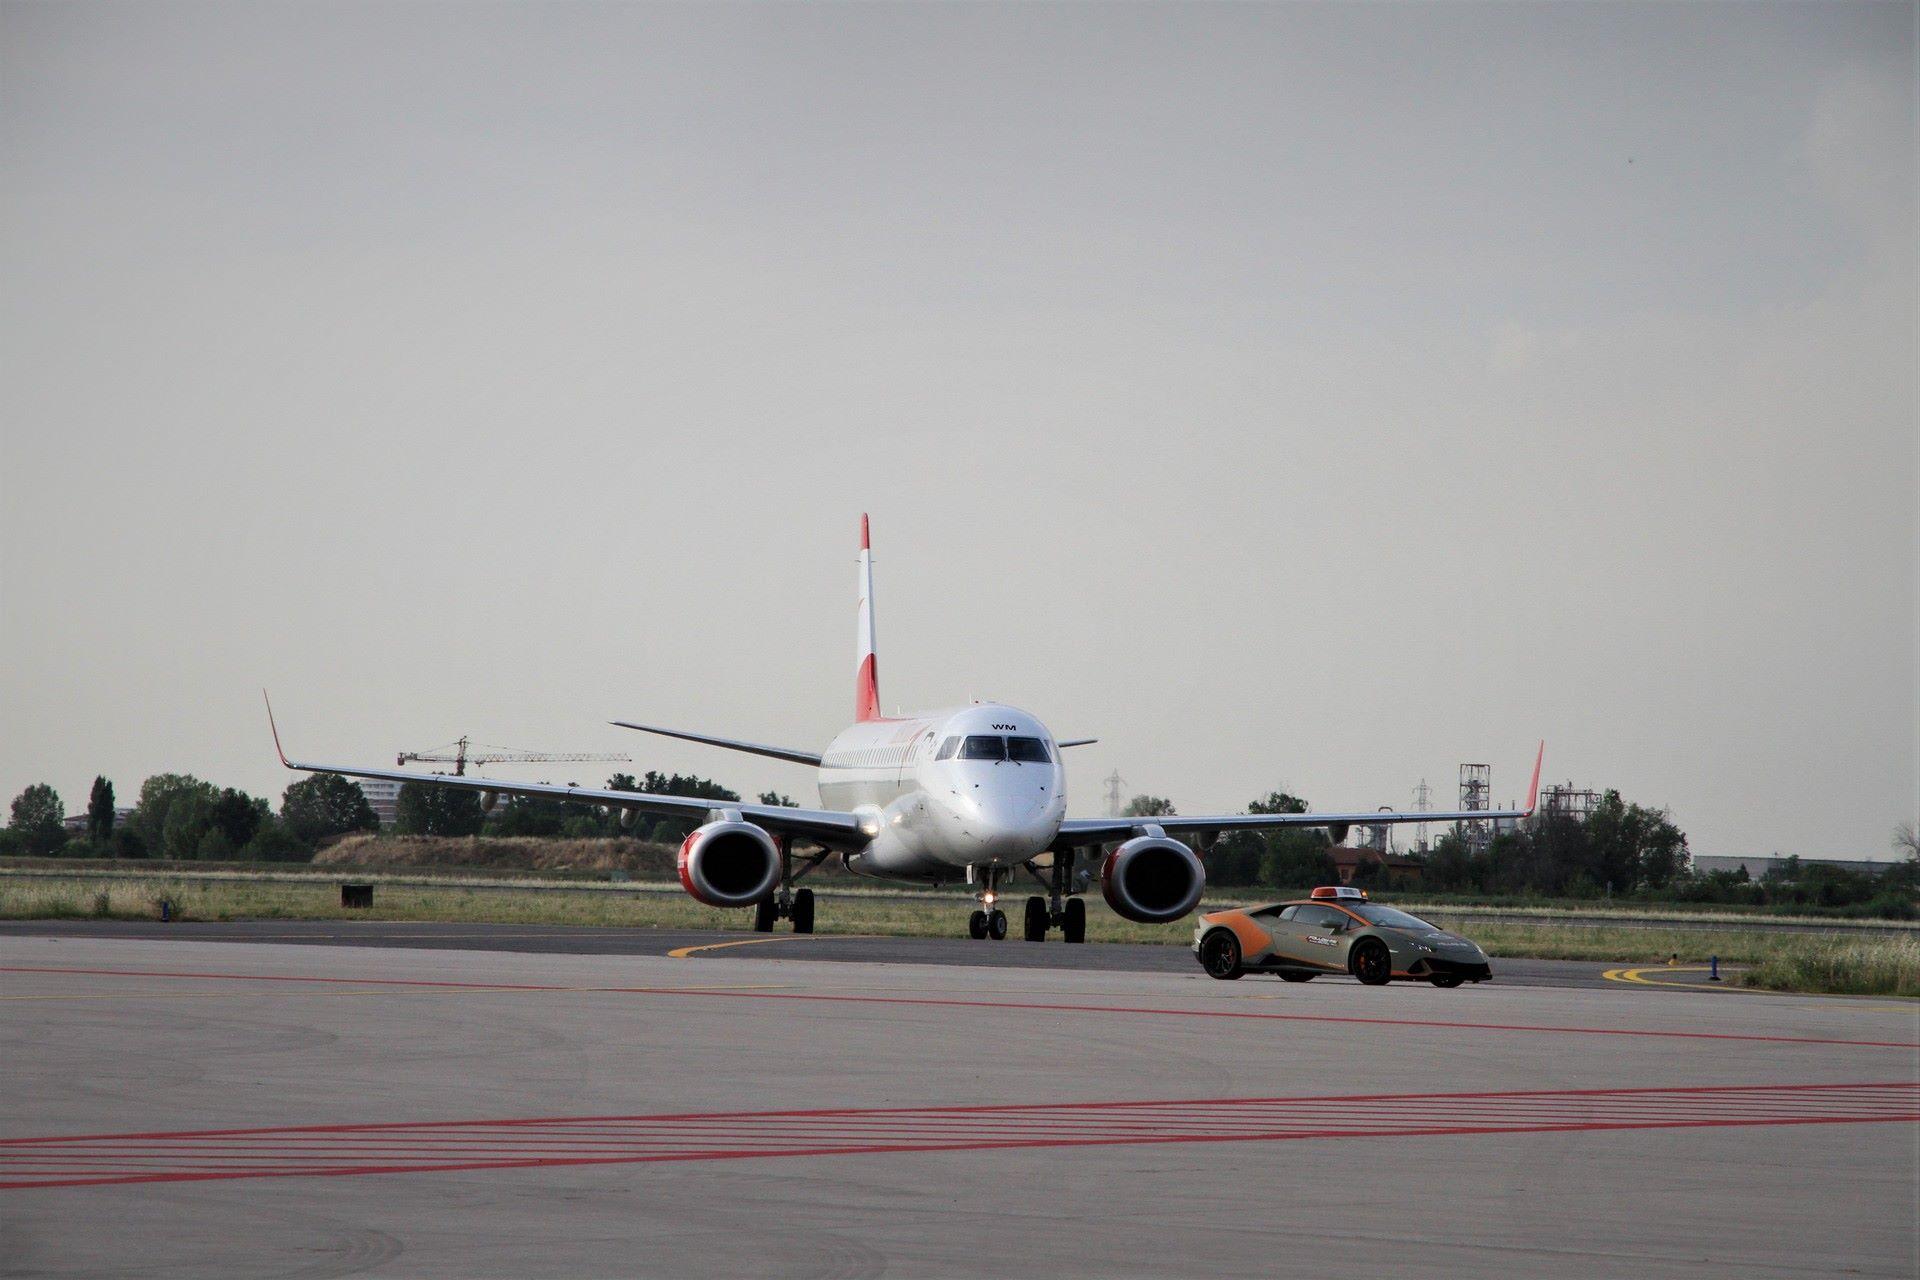 Lamborghini-Huracan-Evo-Follow-Me-bologna-airport-2021-3